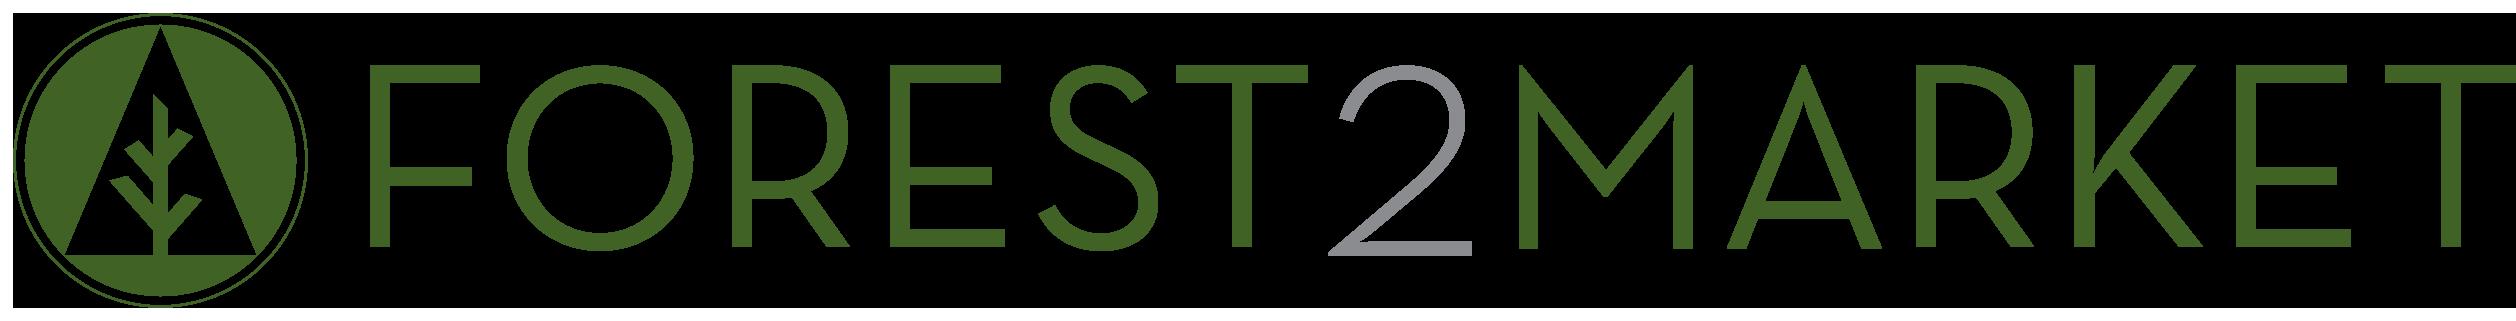 f2m-logo-long.png